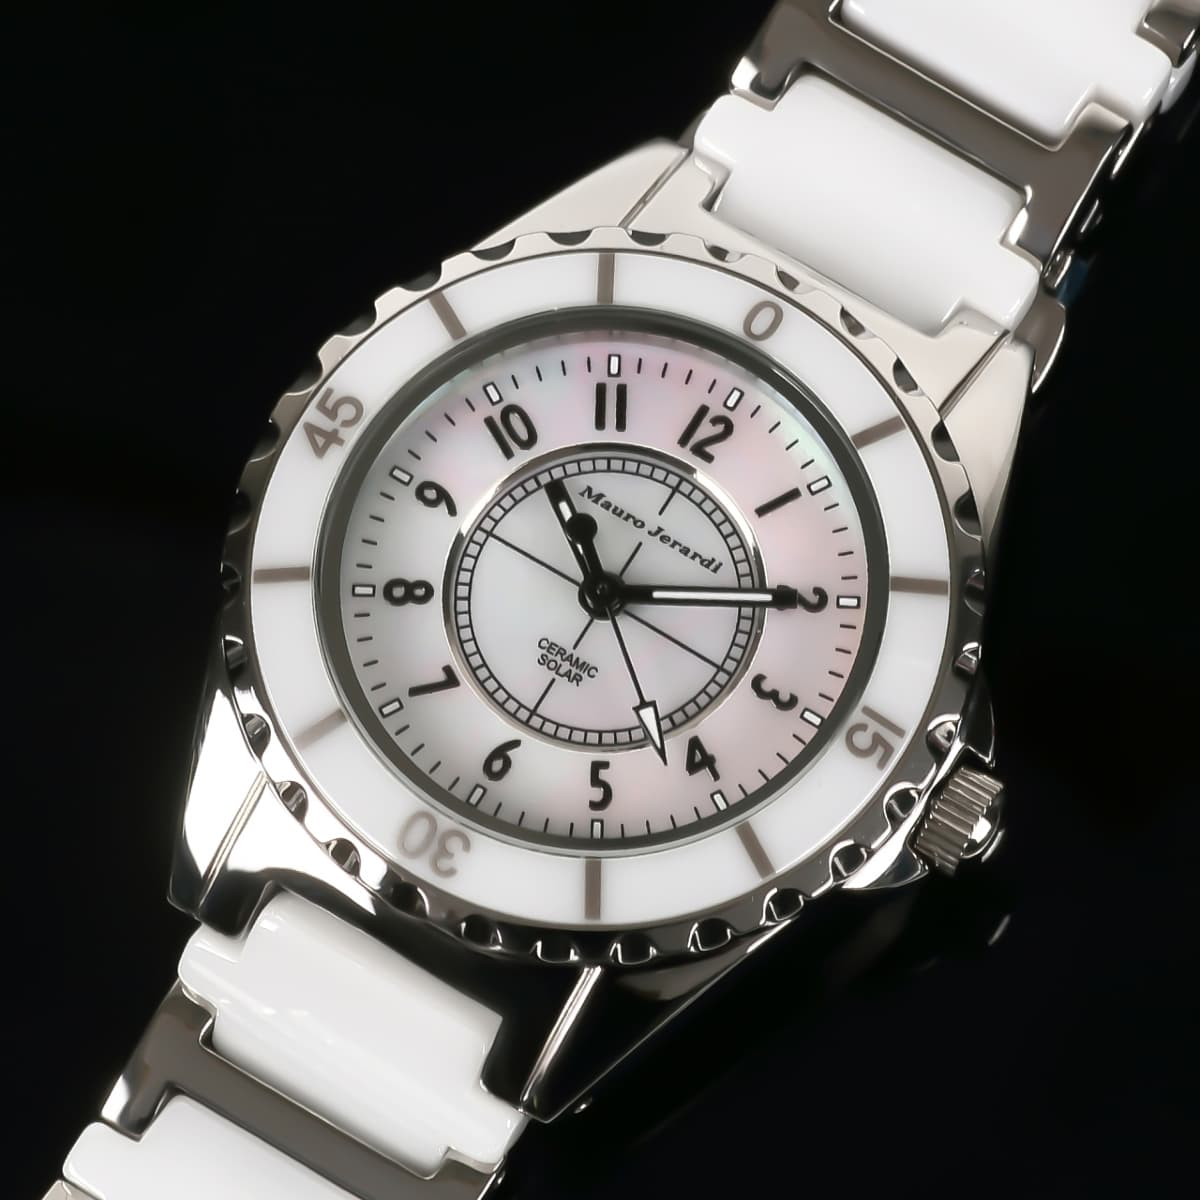 aee7cf7dc0 マウロジェラルディ 腕時計 レディース Mauro Jerardi ソーラー MJ042-2